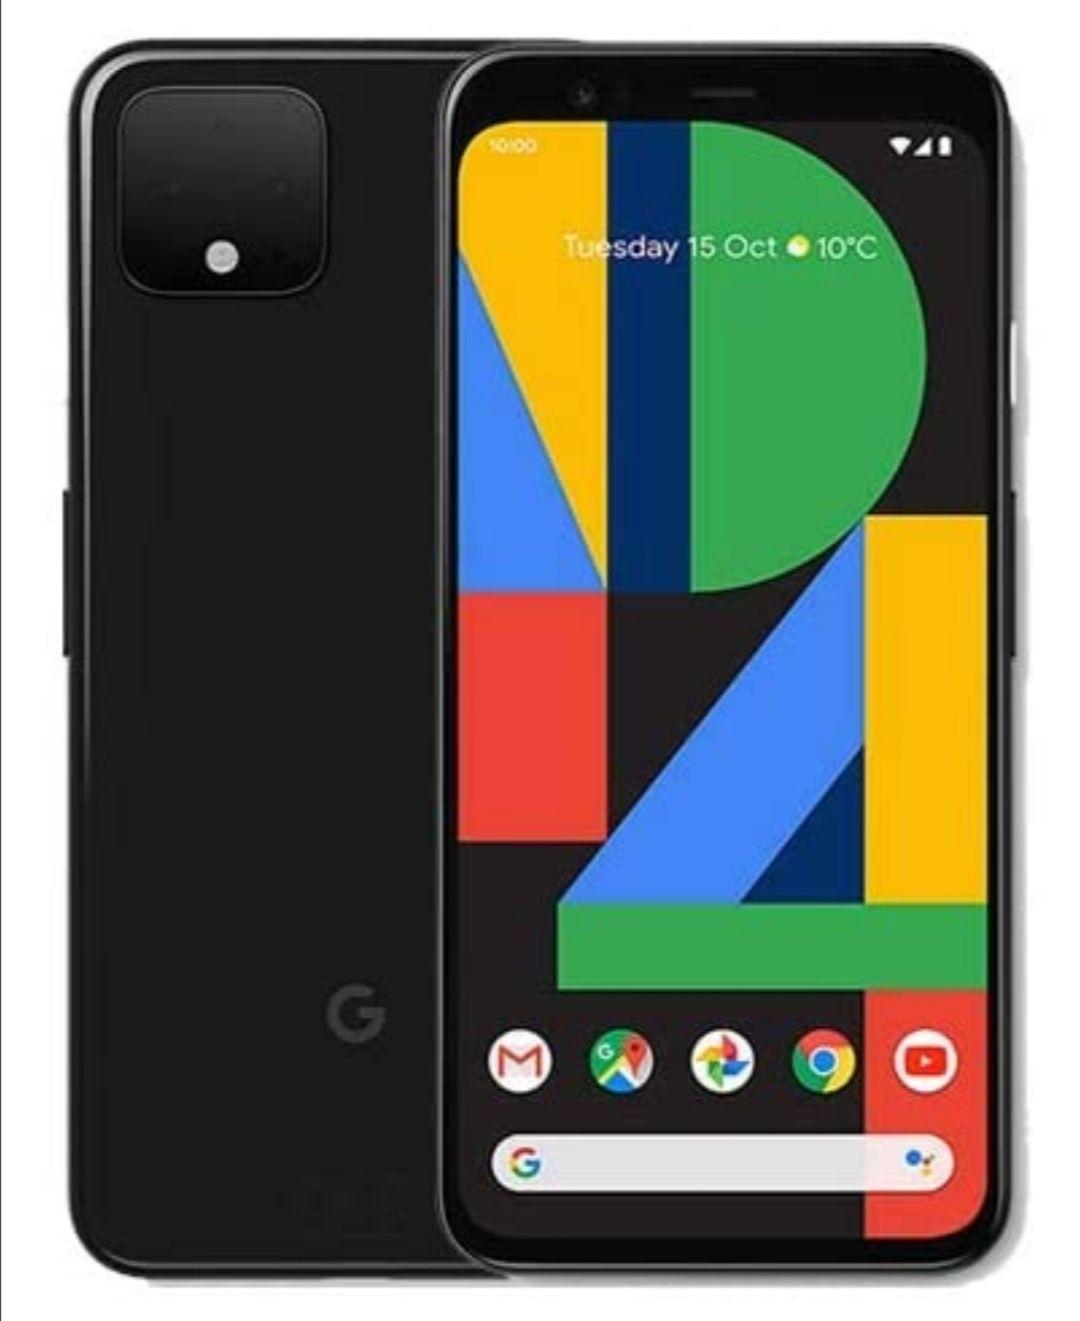 SIM Free Google Pixel 4 128GB Mobile Phone - White Smartphone - £464 @ Argos